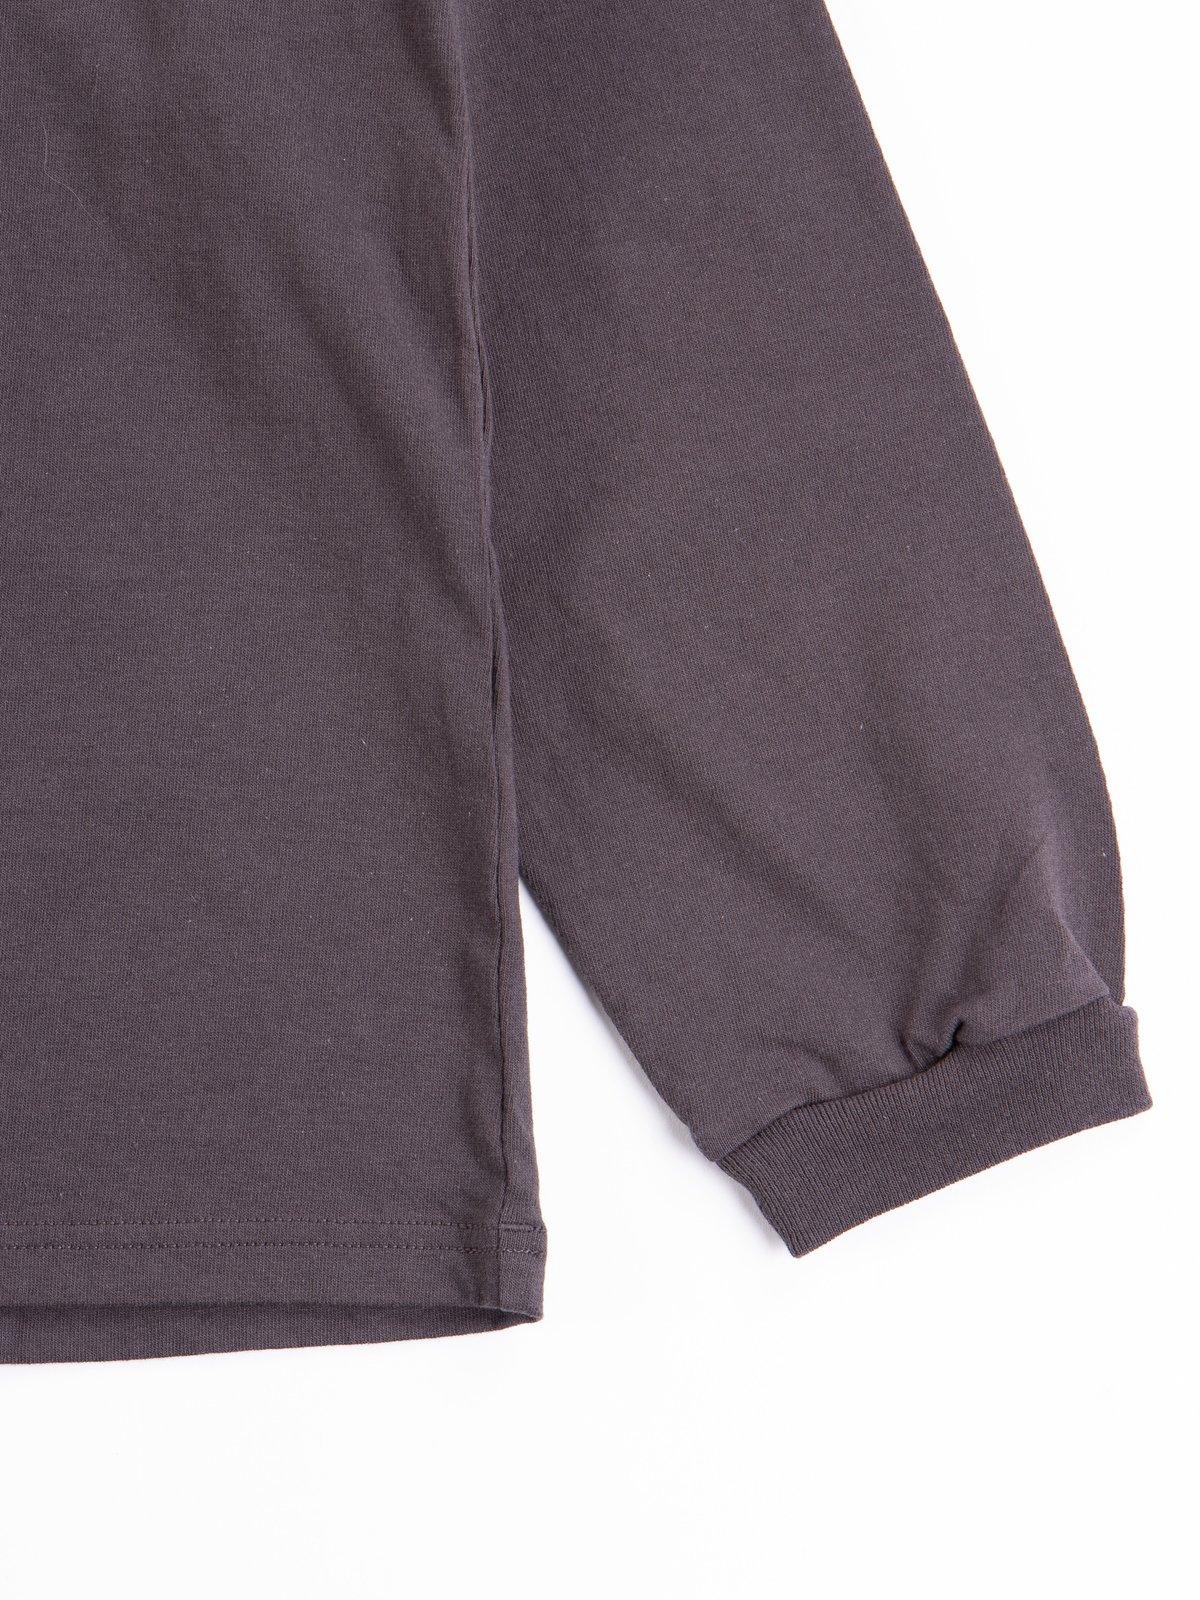 Off Black Long Sleeve Pocket T–Shirt - Image 5